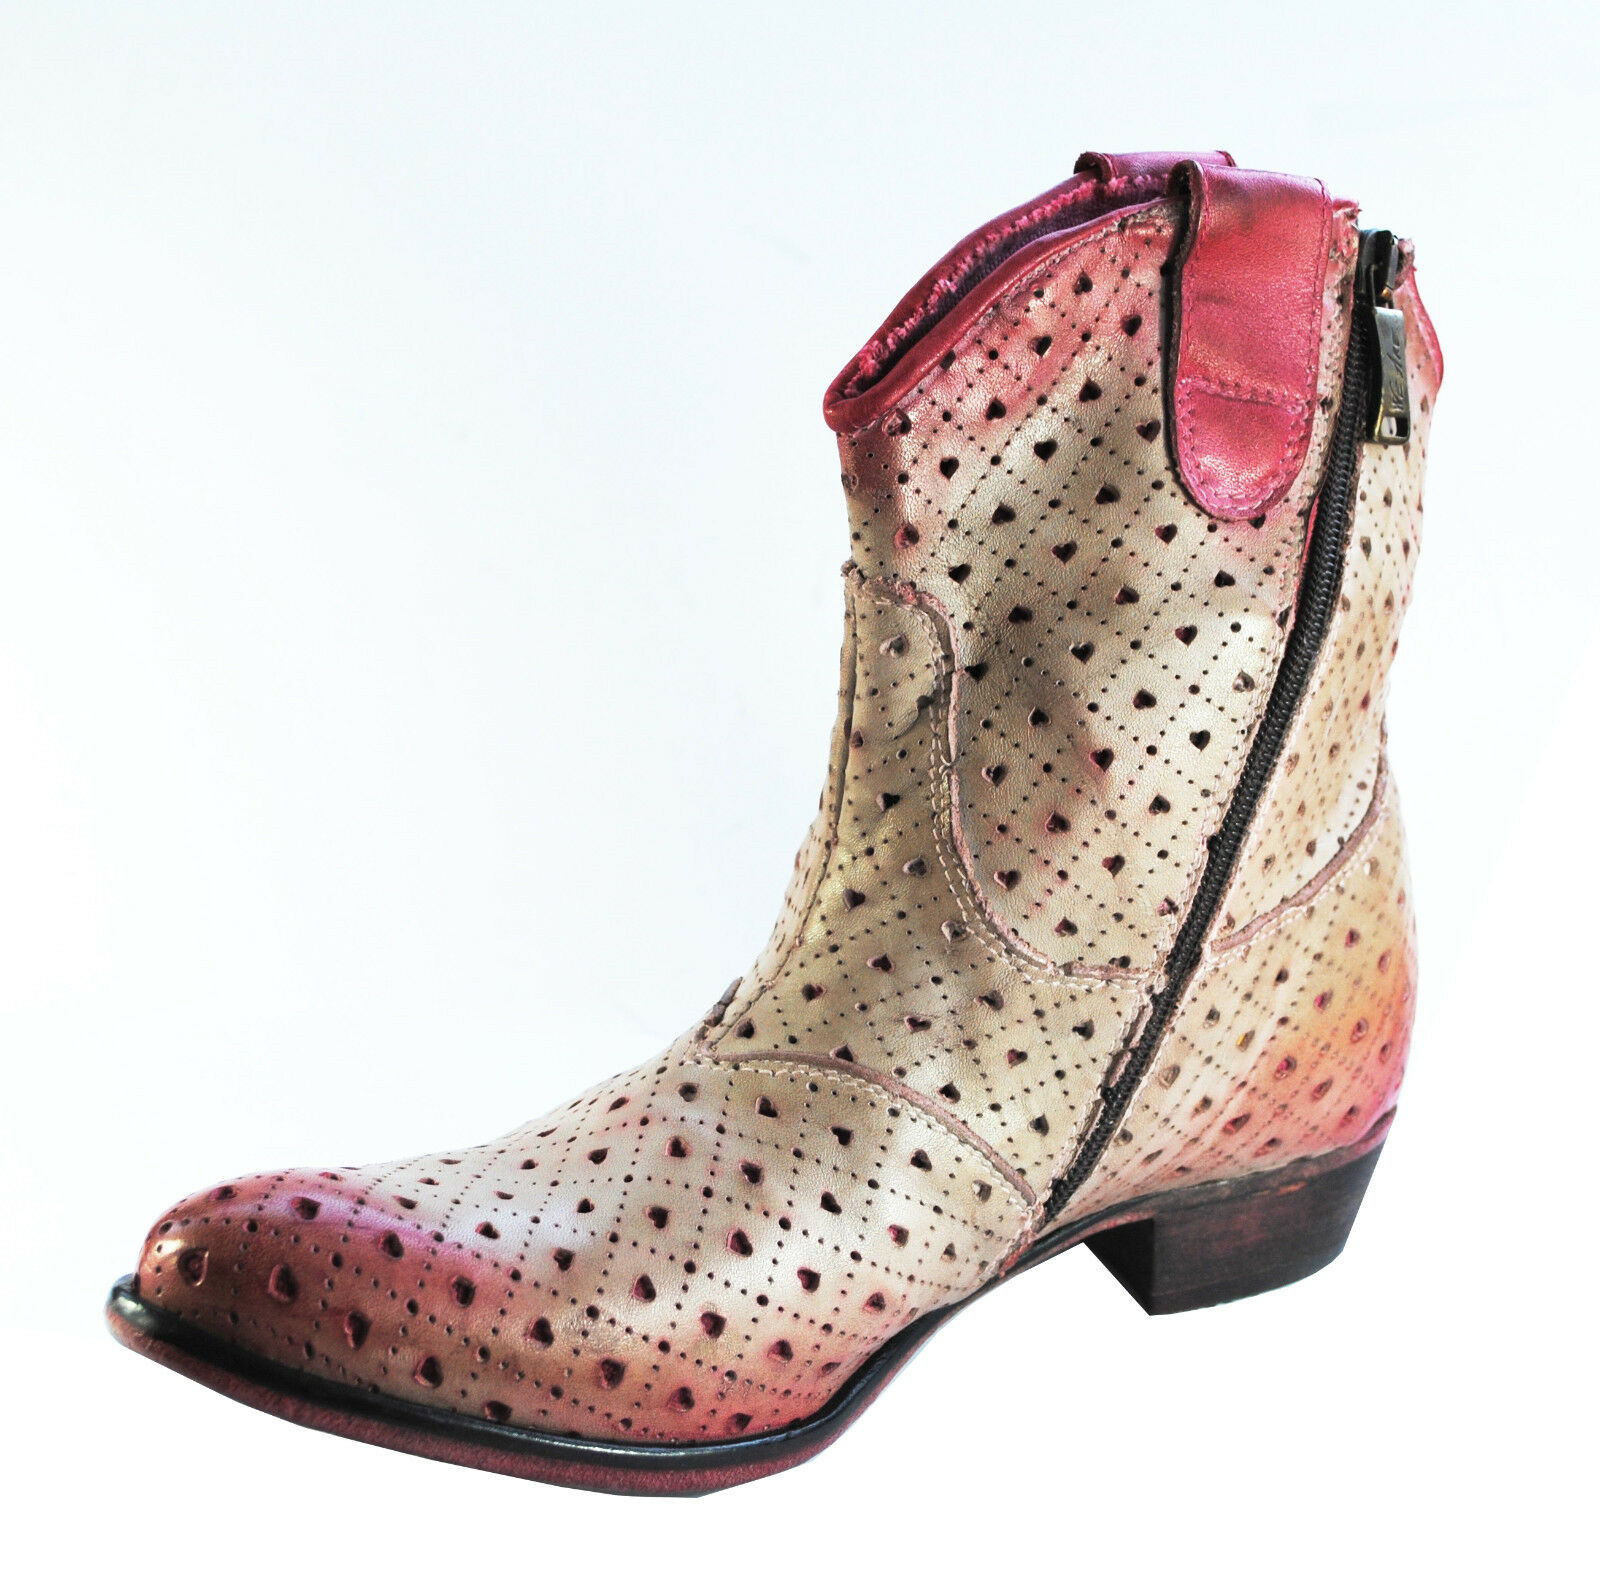 Stiefel Schuhe Stifletten We Are Replay ITALY HAND MADE  Gr. 36 Neu